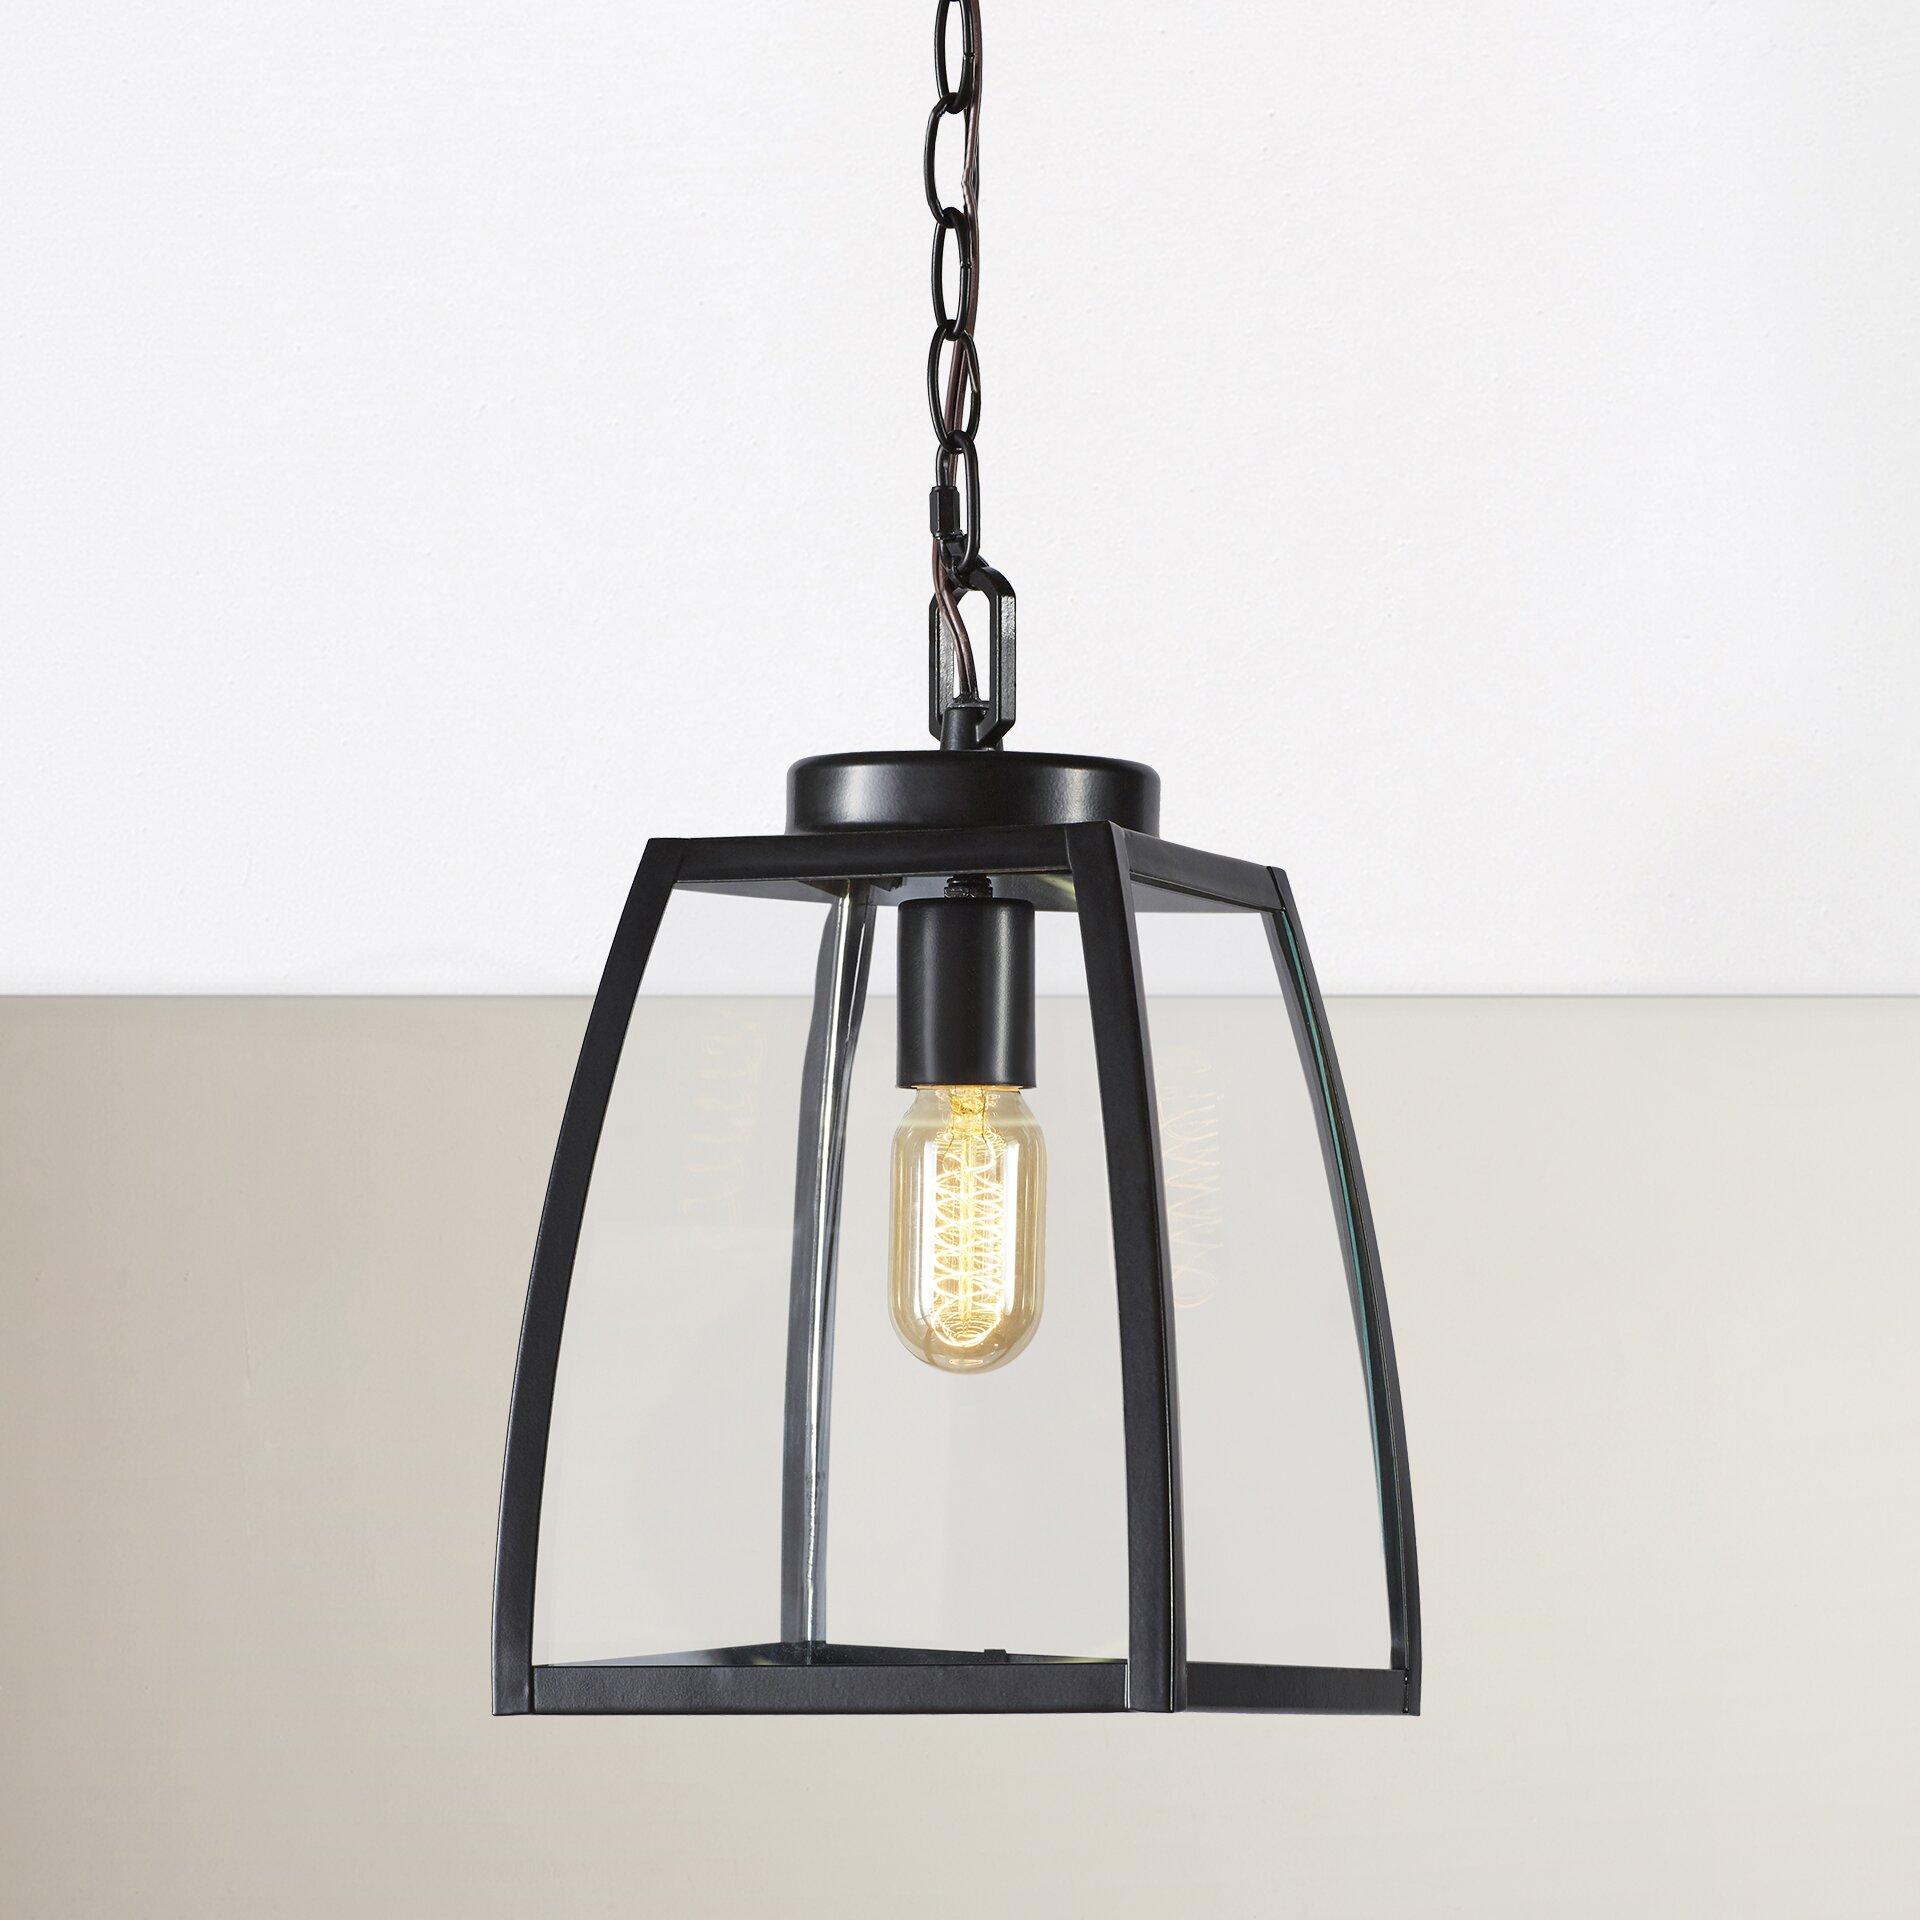 Wayfair Outdoor Hanging Lights: Red Barrel Studio Silver Gulch 1 Light Outdoor Pendant